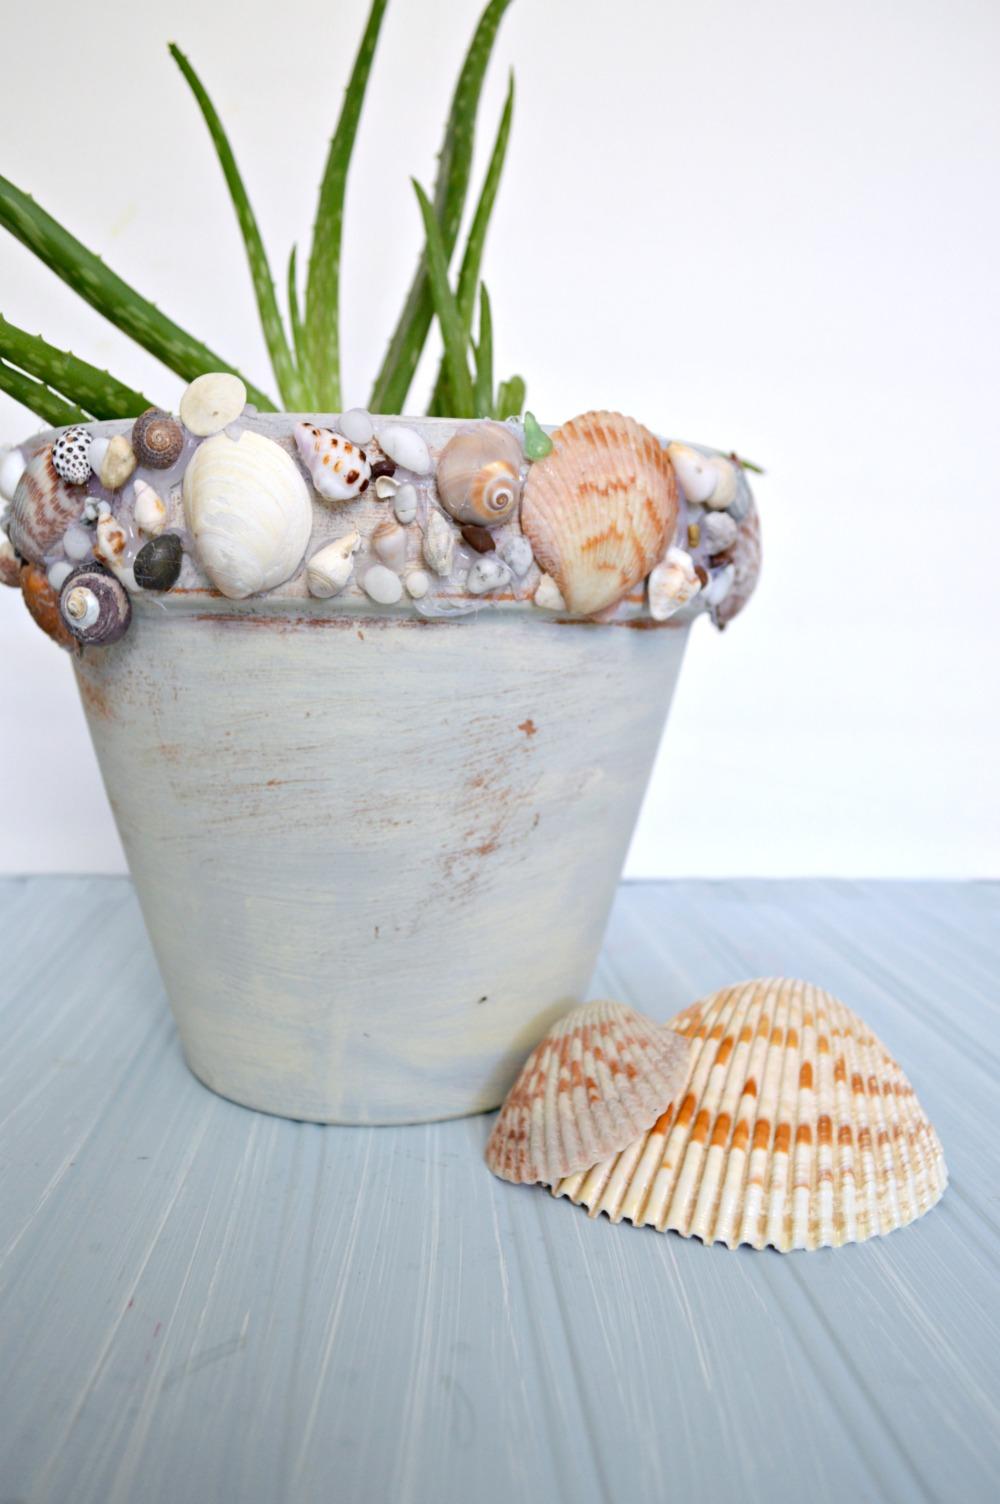 DIY Shell Pot, so easy to make!